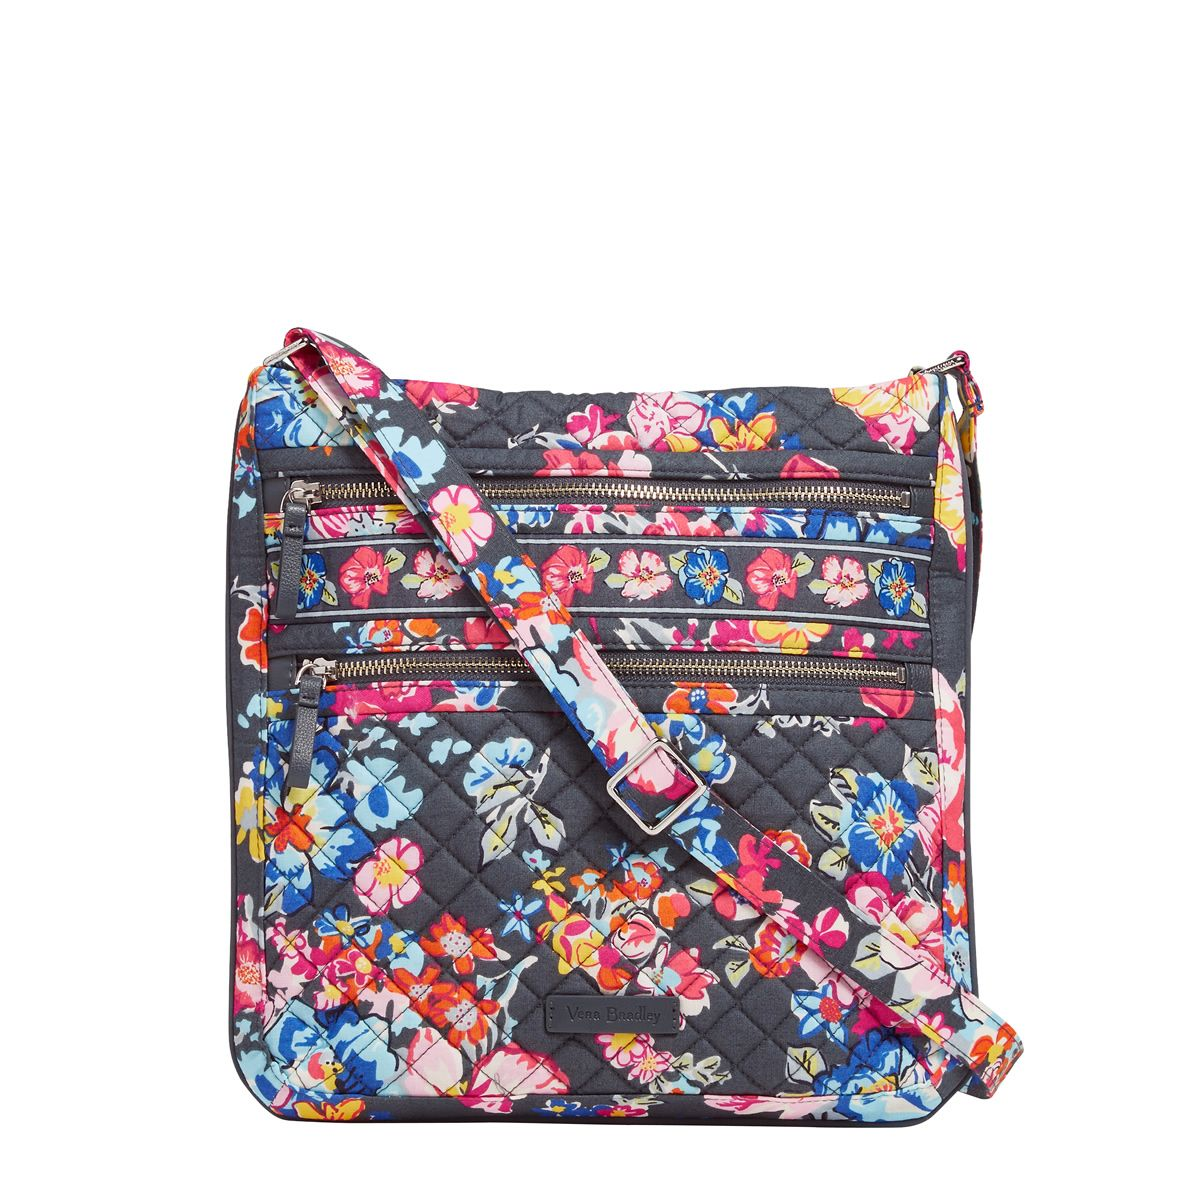 11a9b22899 Vera Bradley Handbags - Macy s